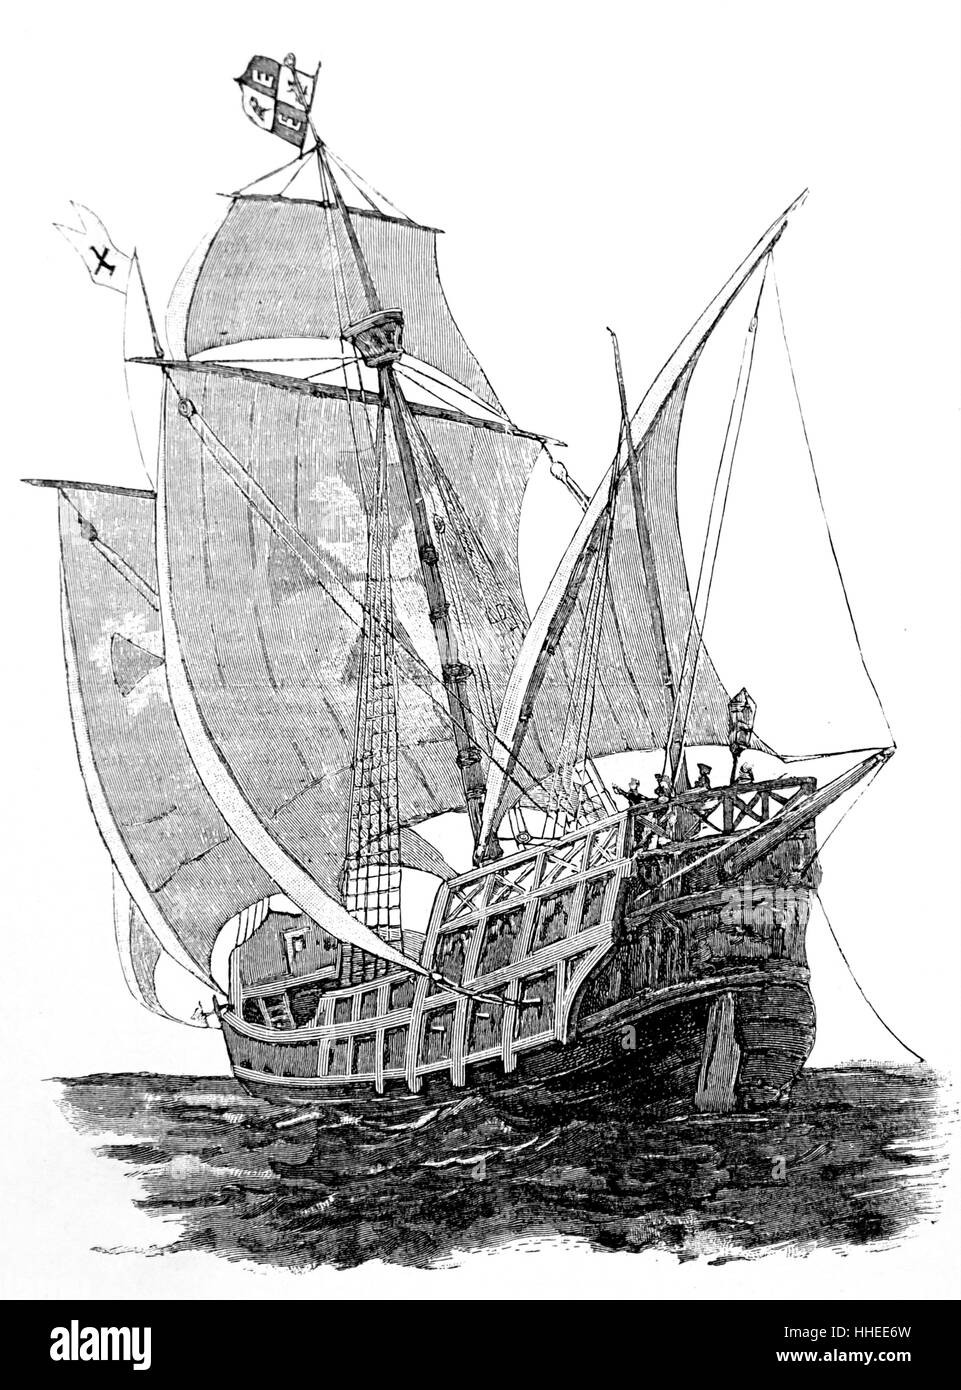 Woodblock print of a Caravel - Stock Image